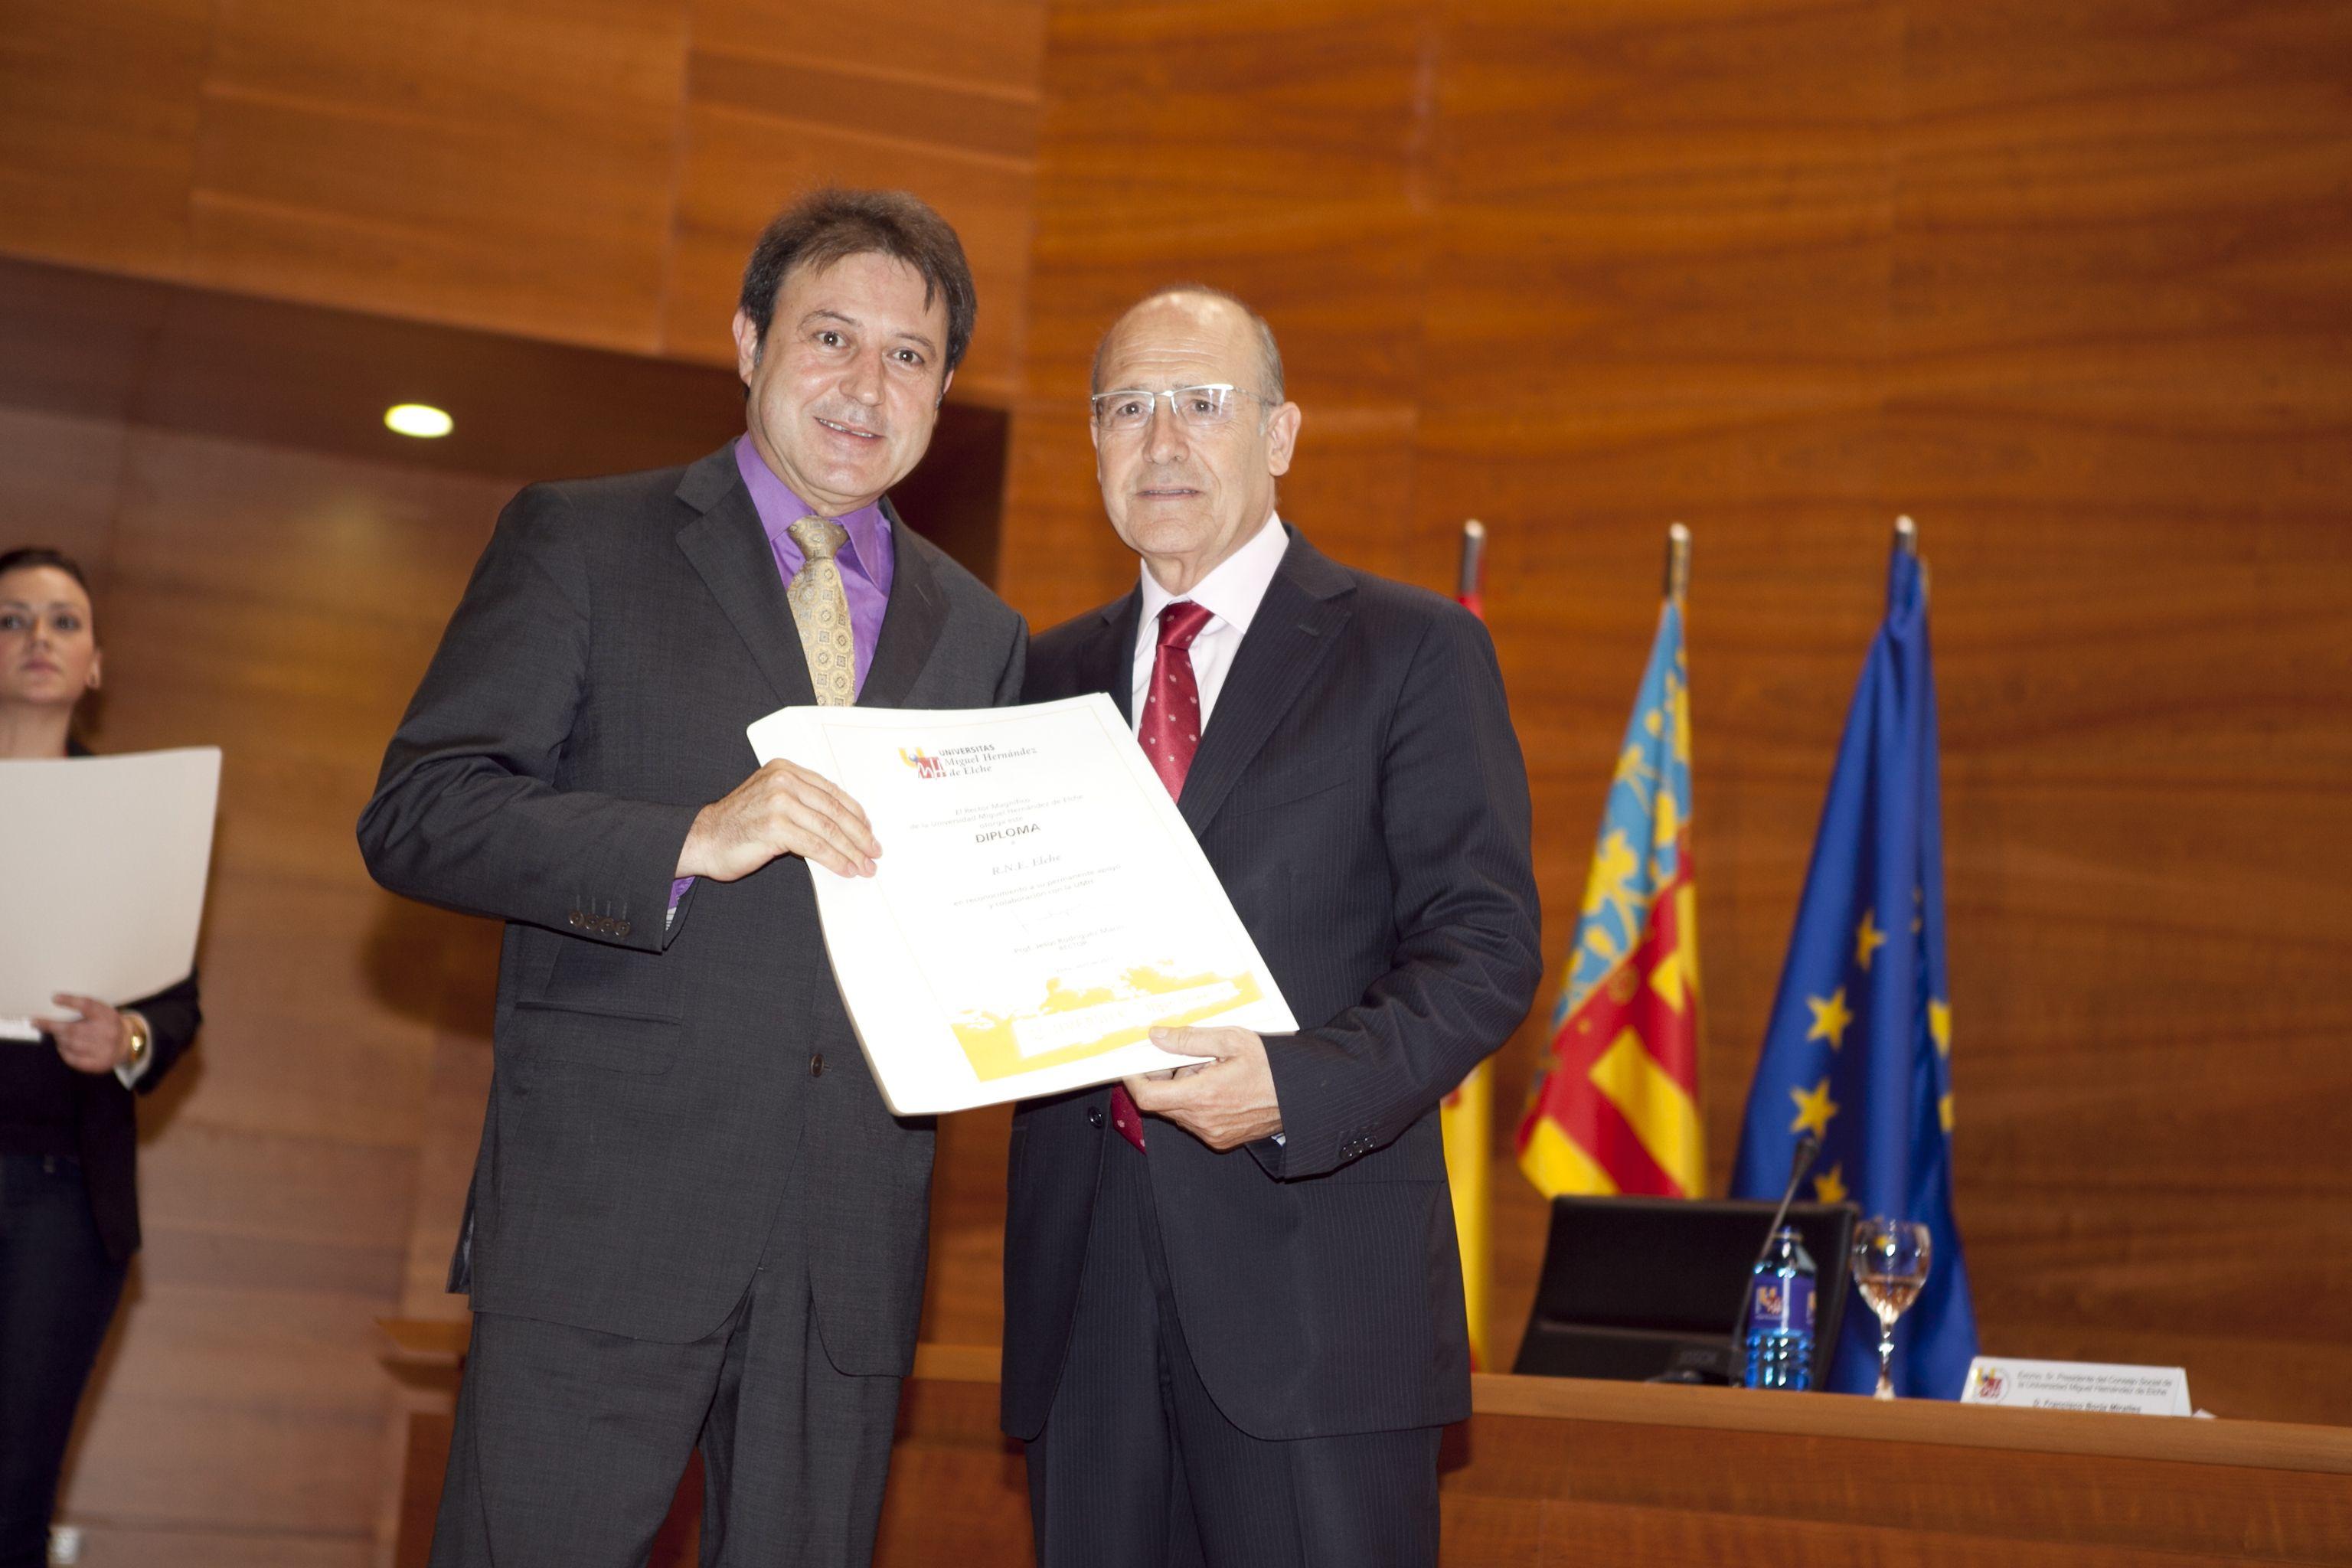 umh-diplomas-rector_mg_6878.jpg